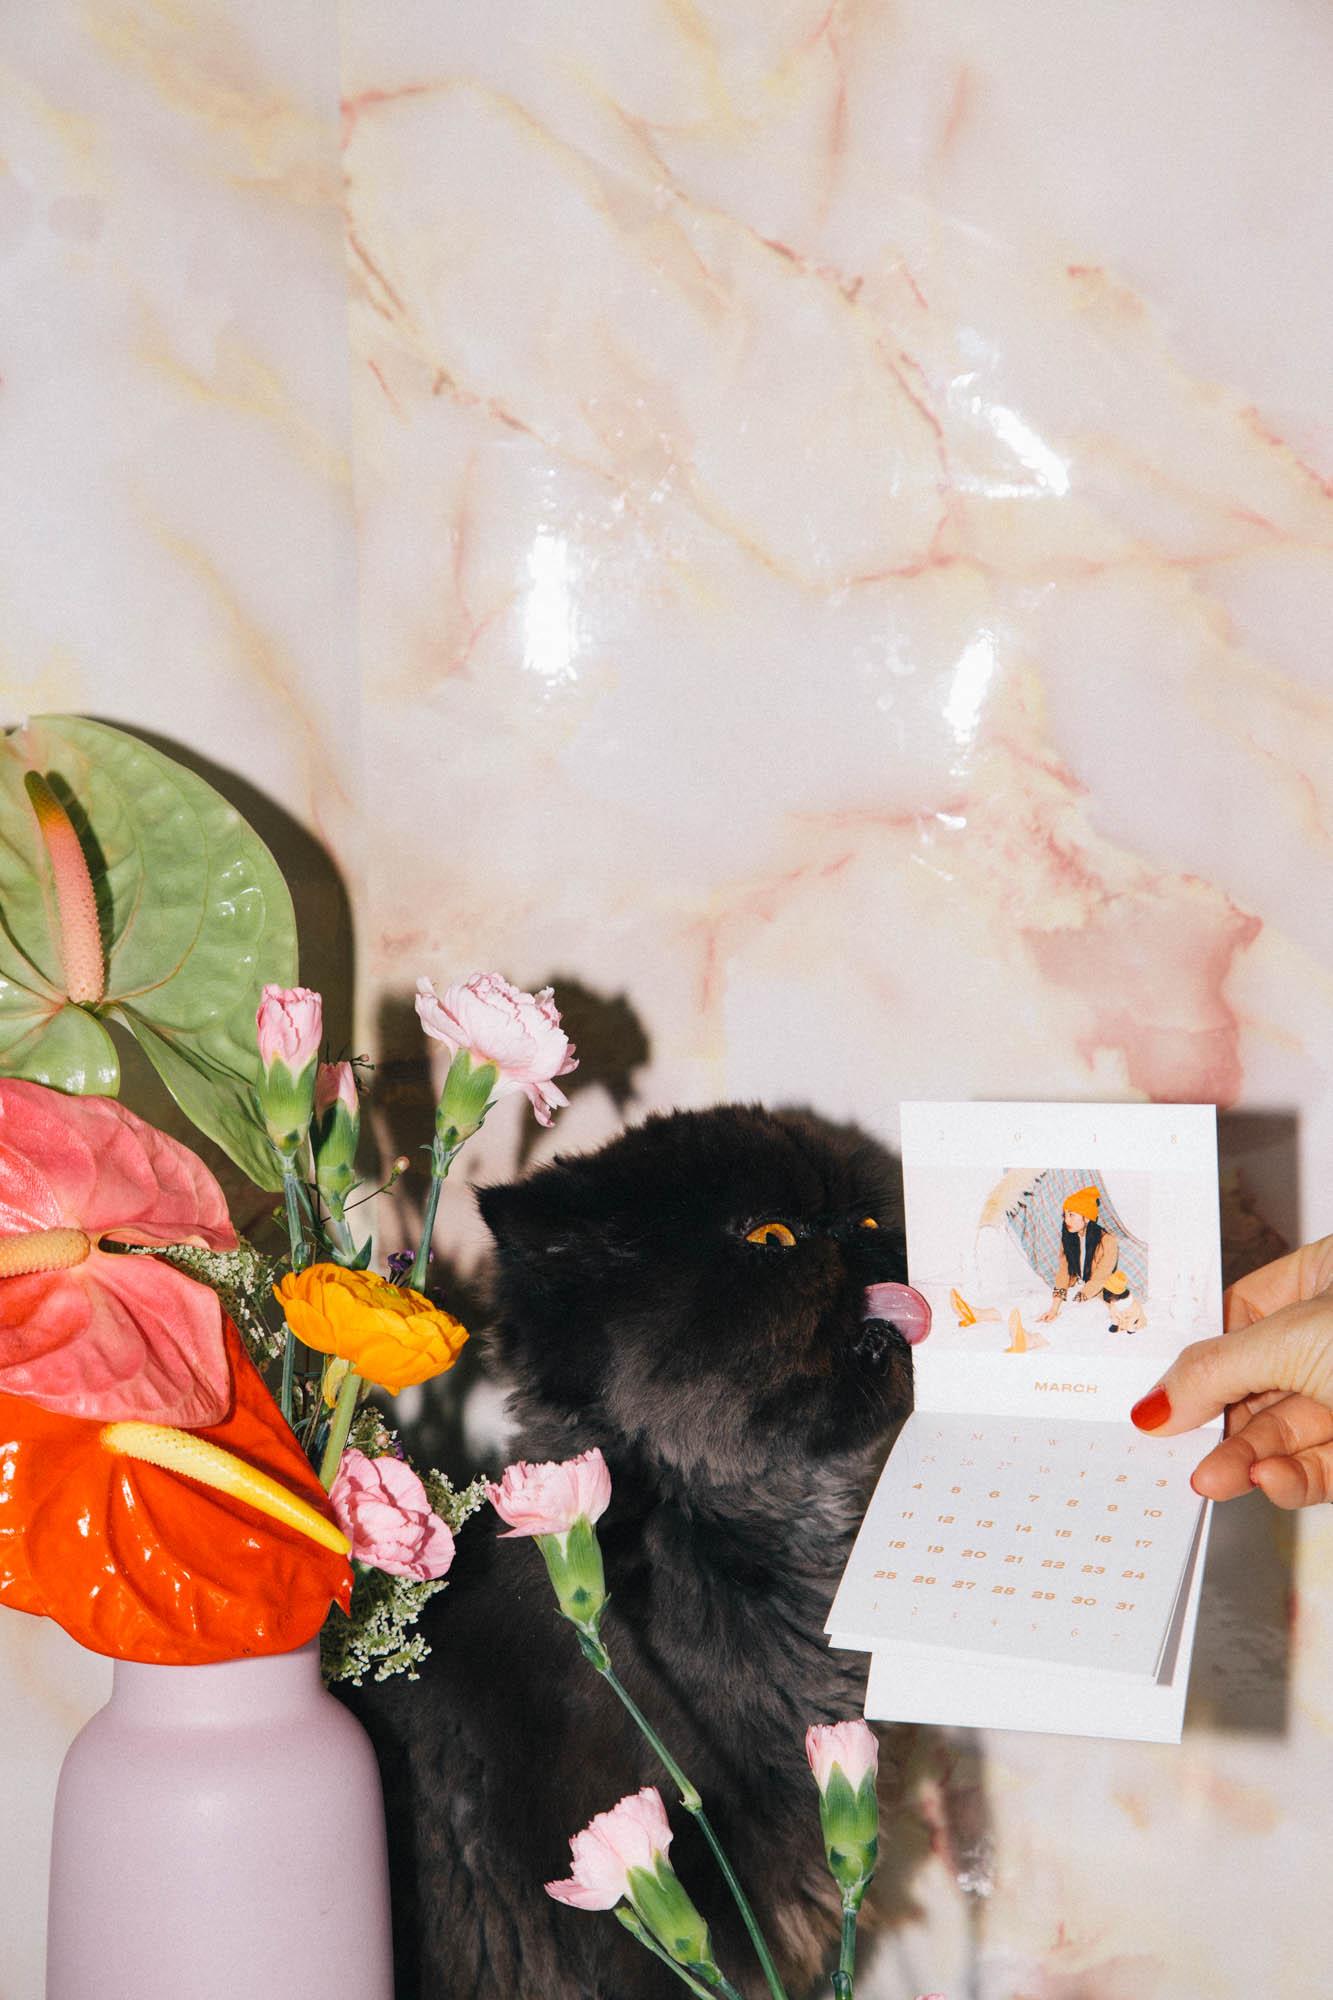 IMG_6837-cat-calendar-puno-goodsgang-krizia-2018-3.jpg